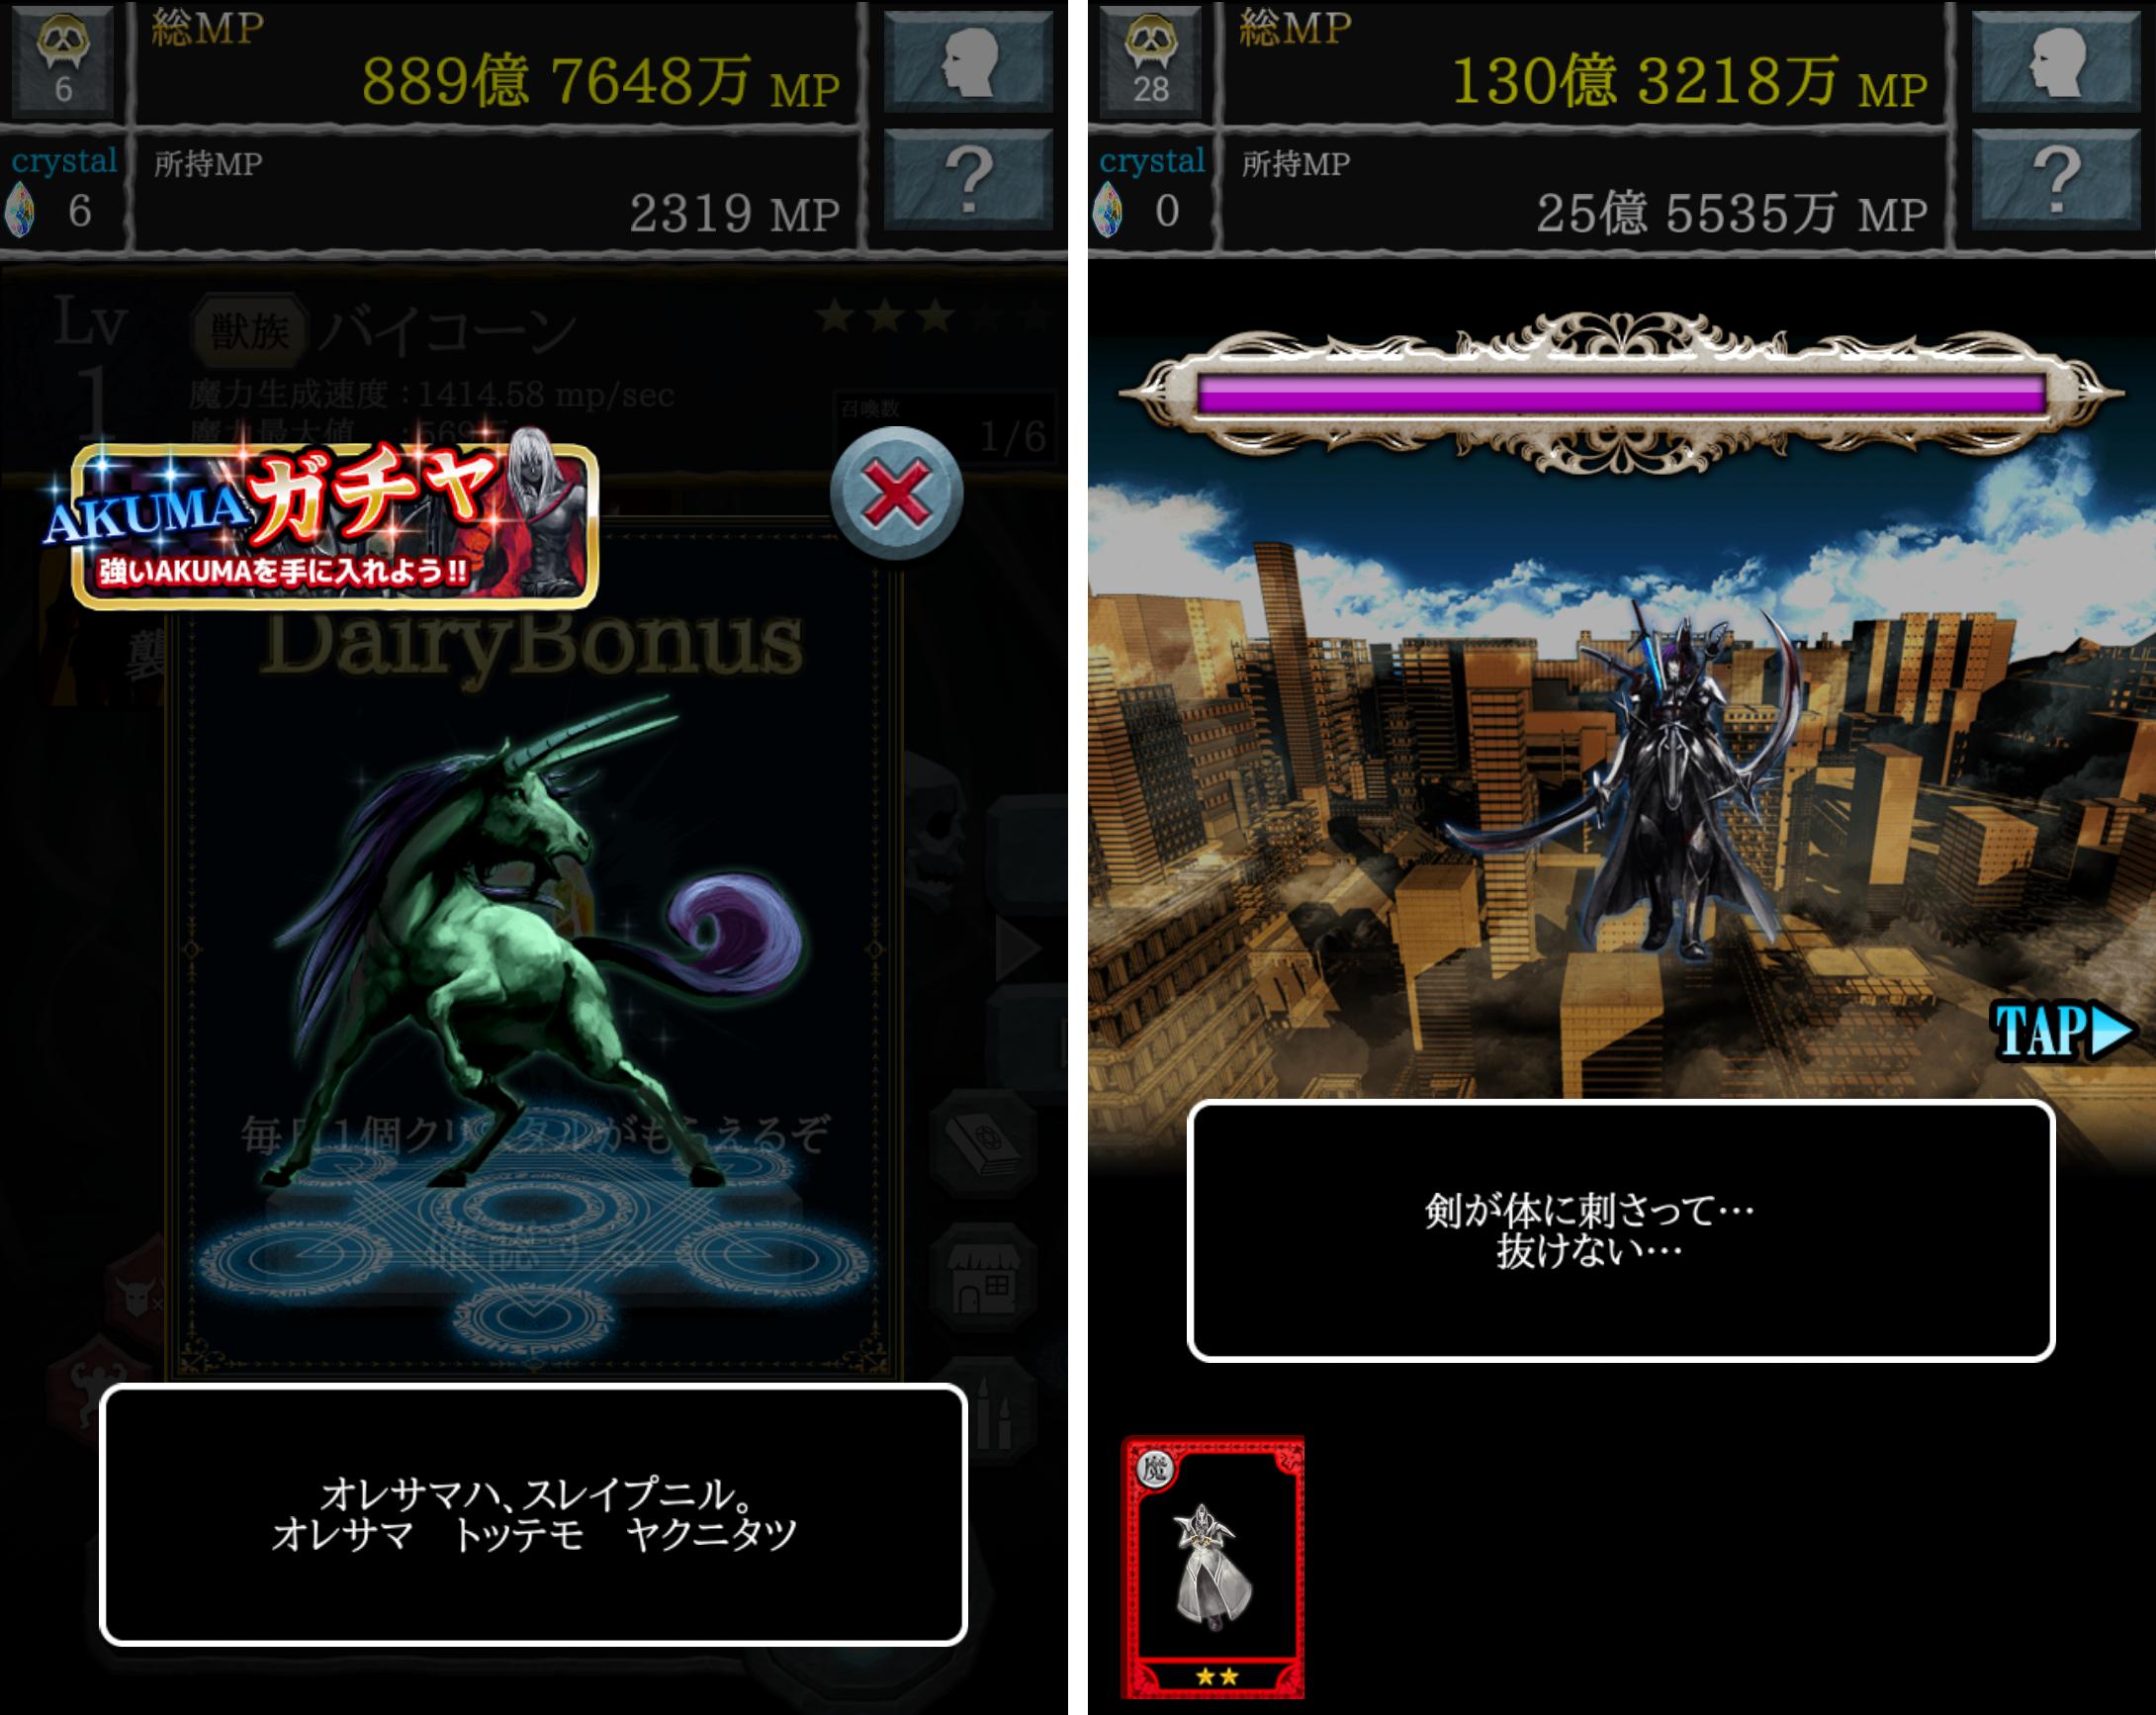 AKUMA大戦 -悪魔合体召喚- androidアプリスクリーンショット2